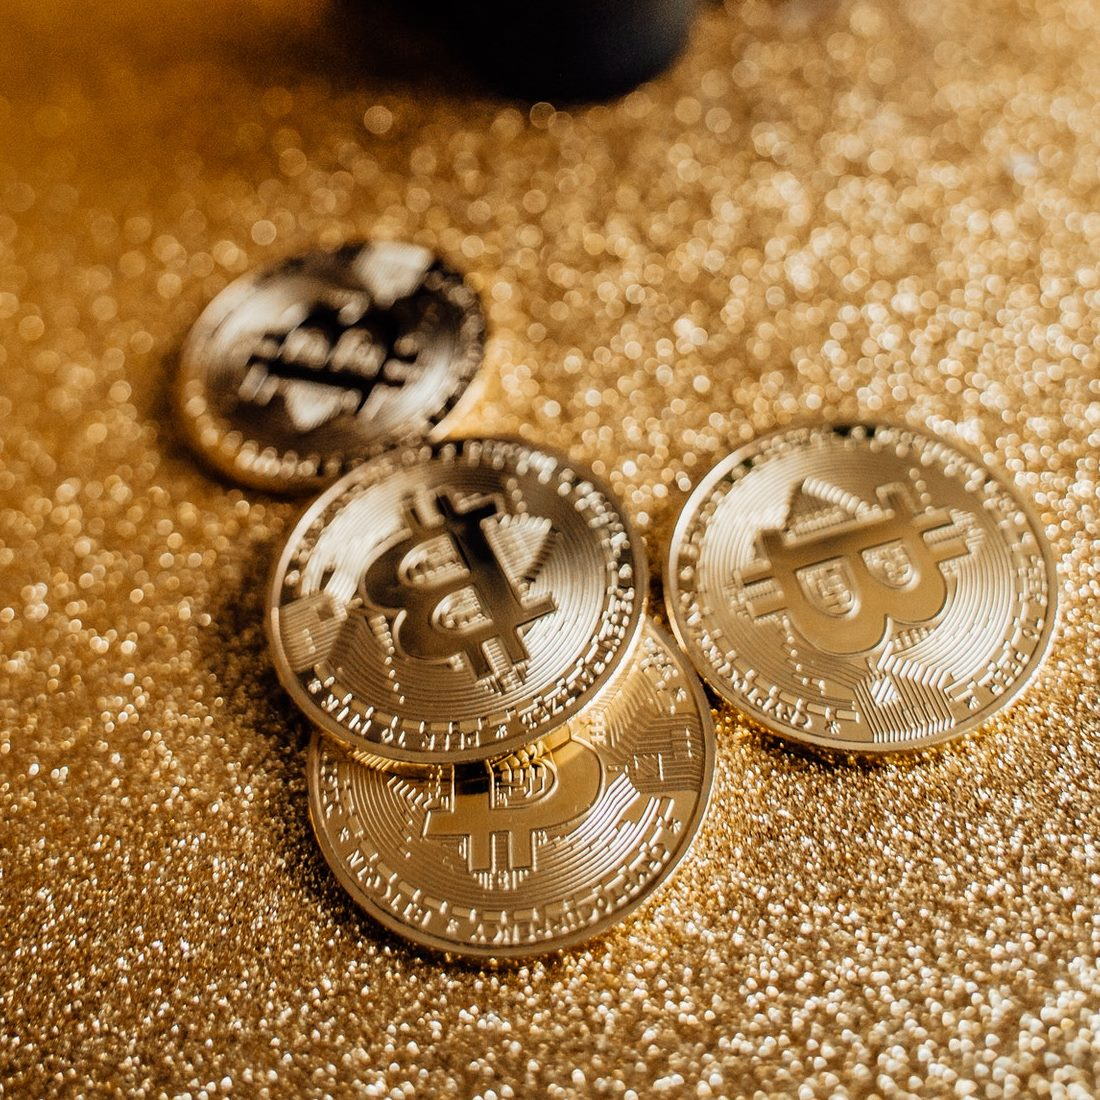 Bitcoin Criptomonedas Jack Dorsey Twitter Jay Z Pexels